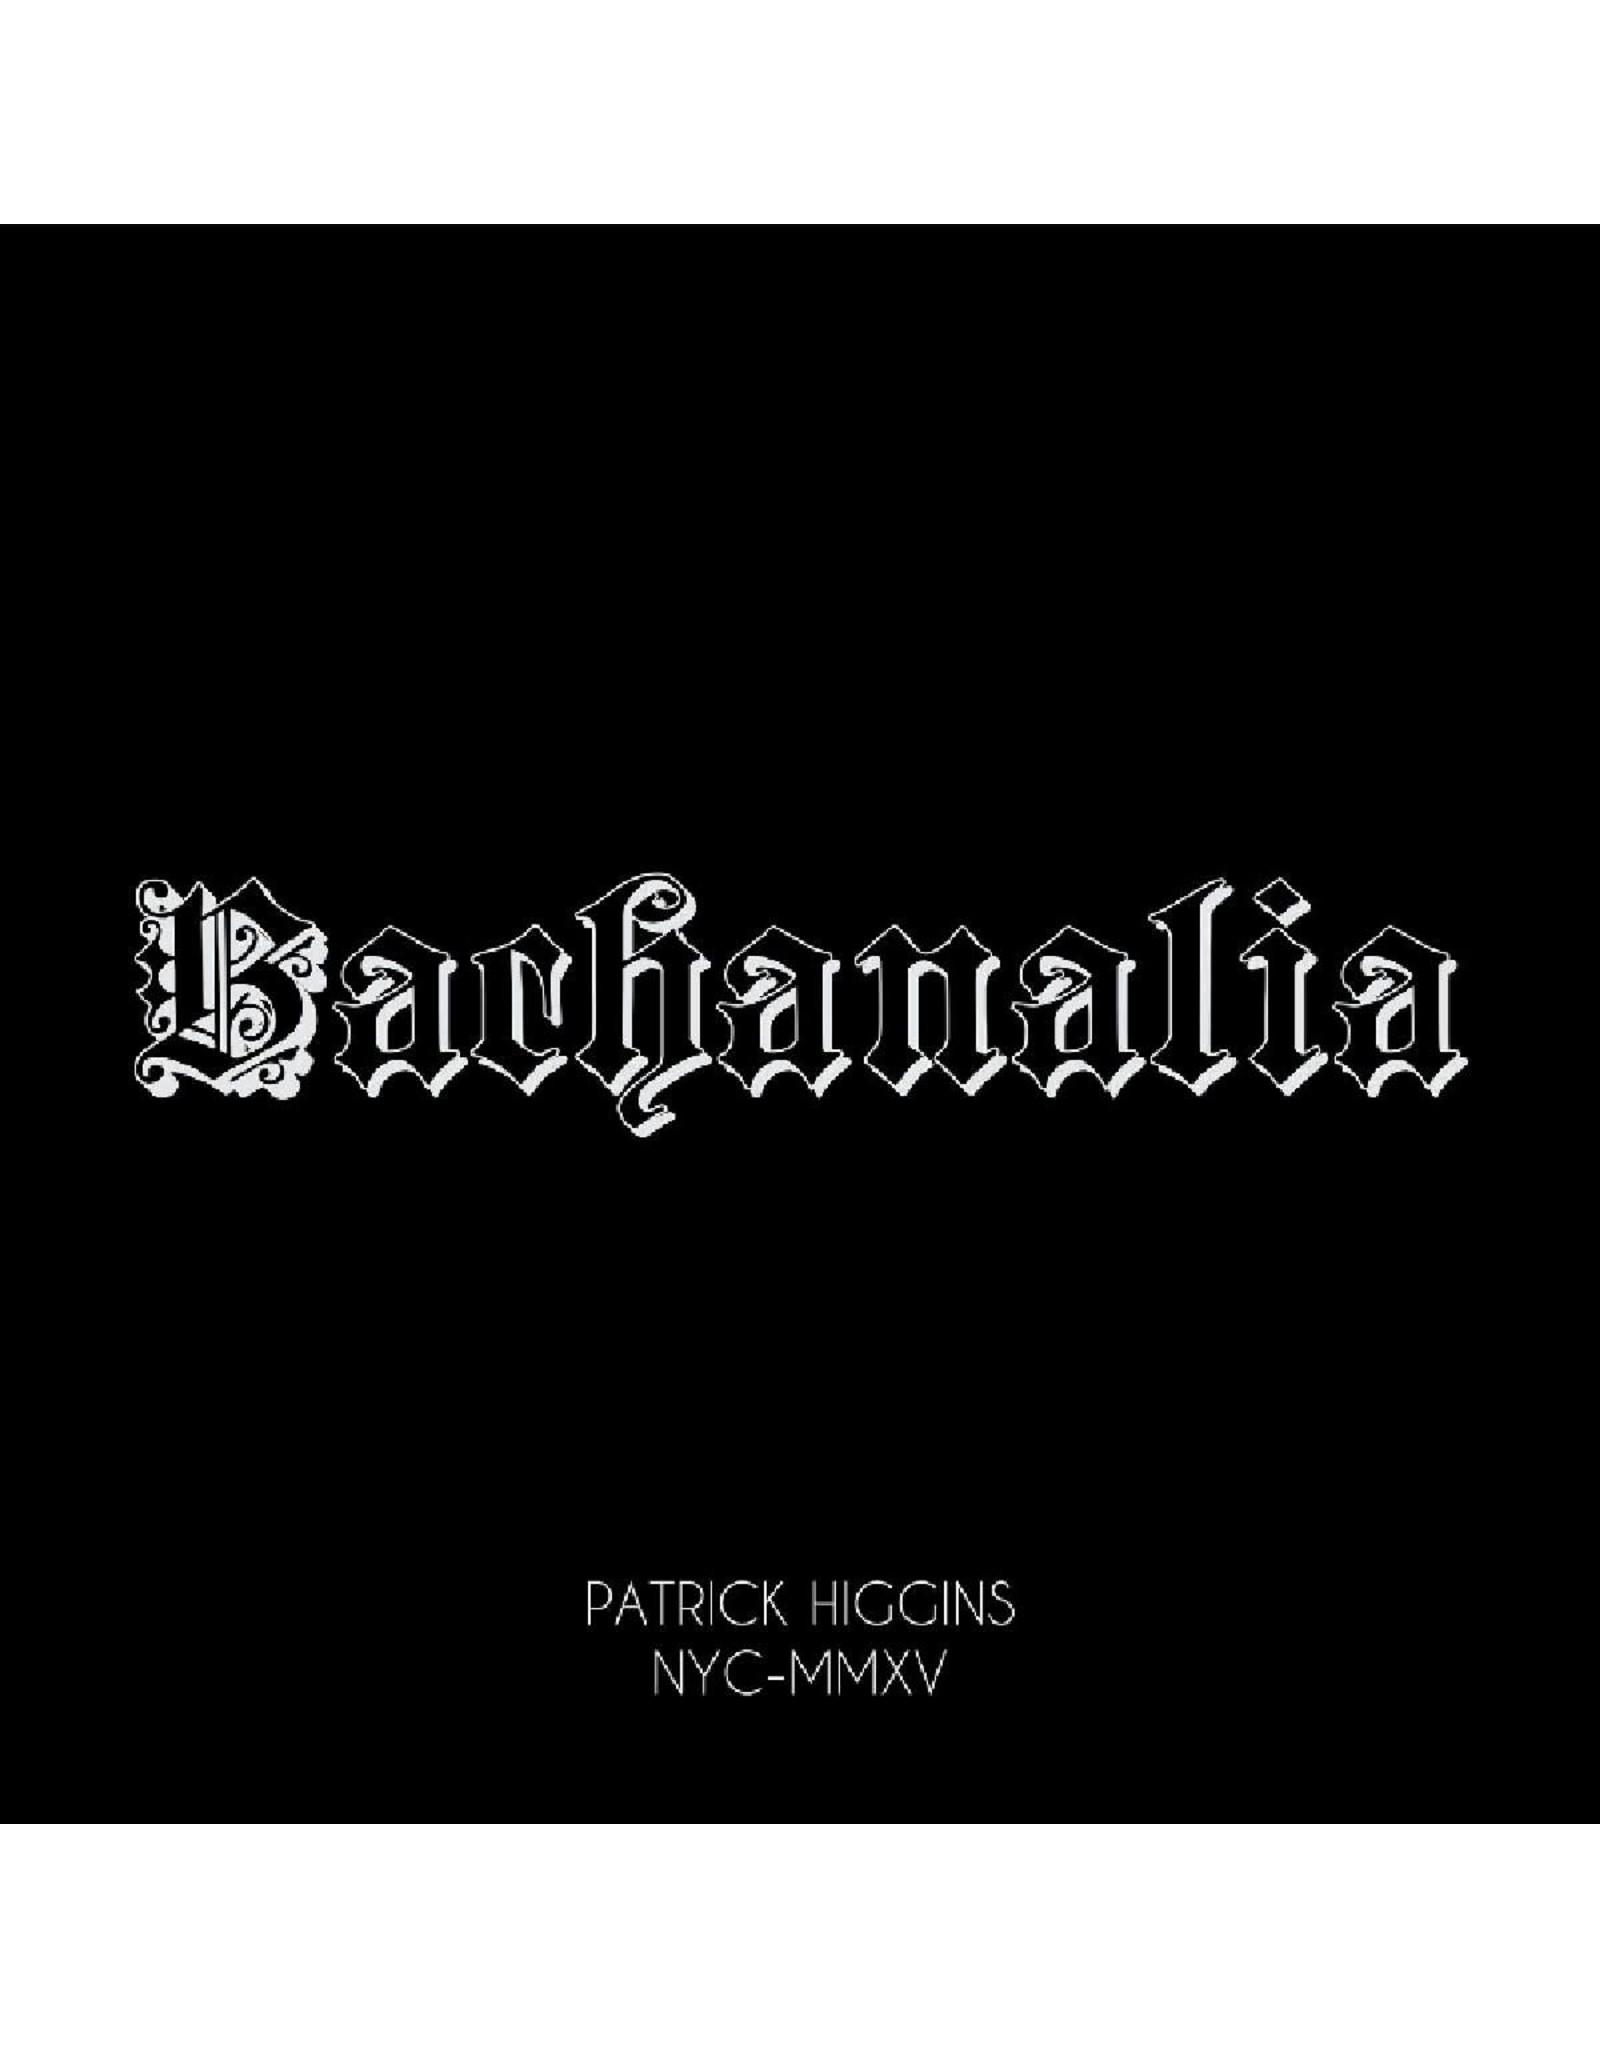 New Vinyl Patrick Higgins - Bachanalia LP